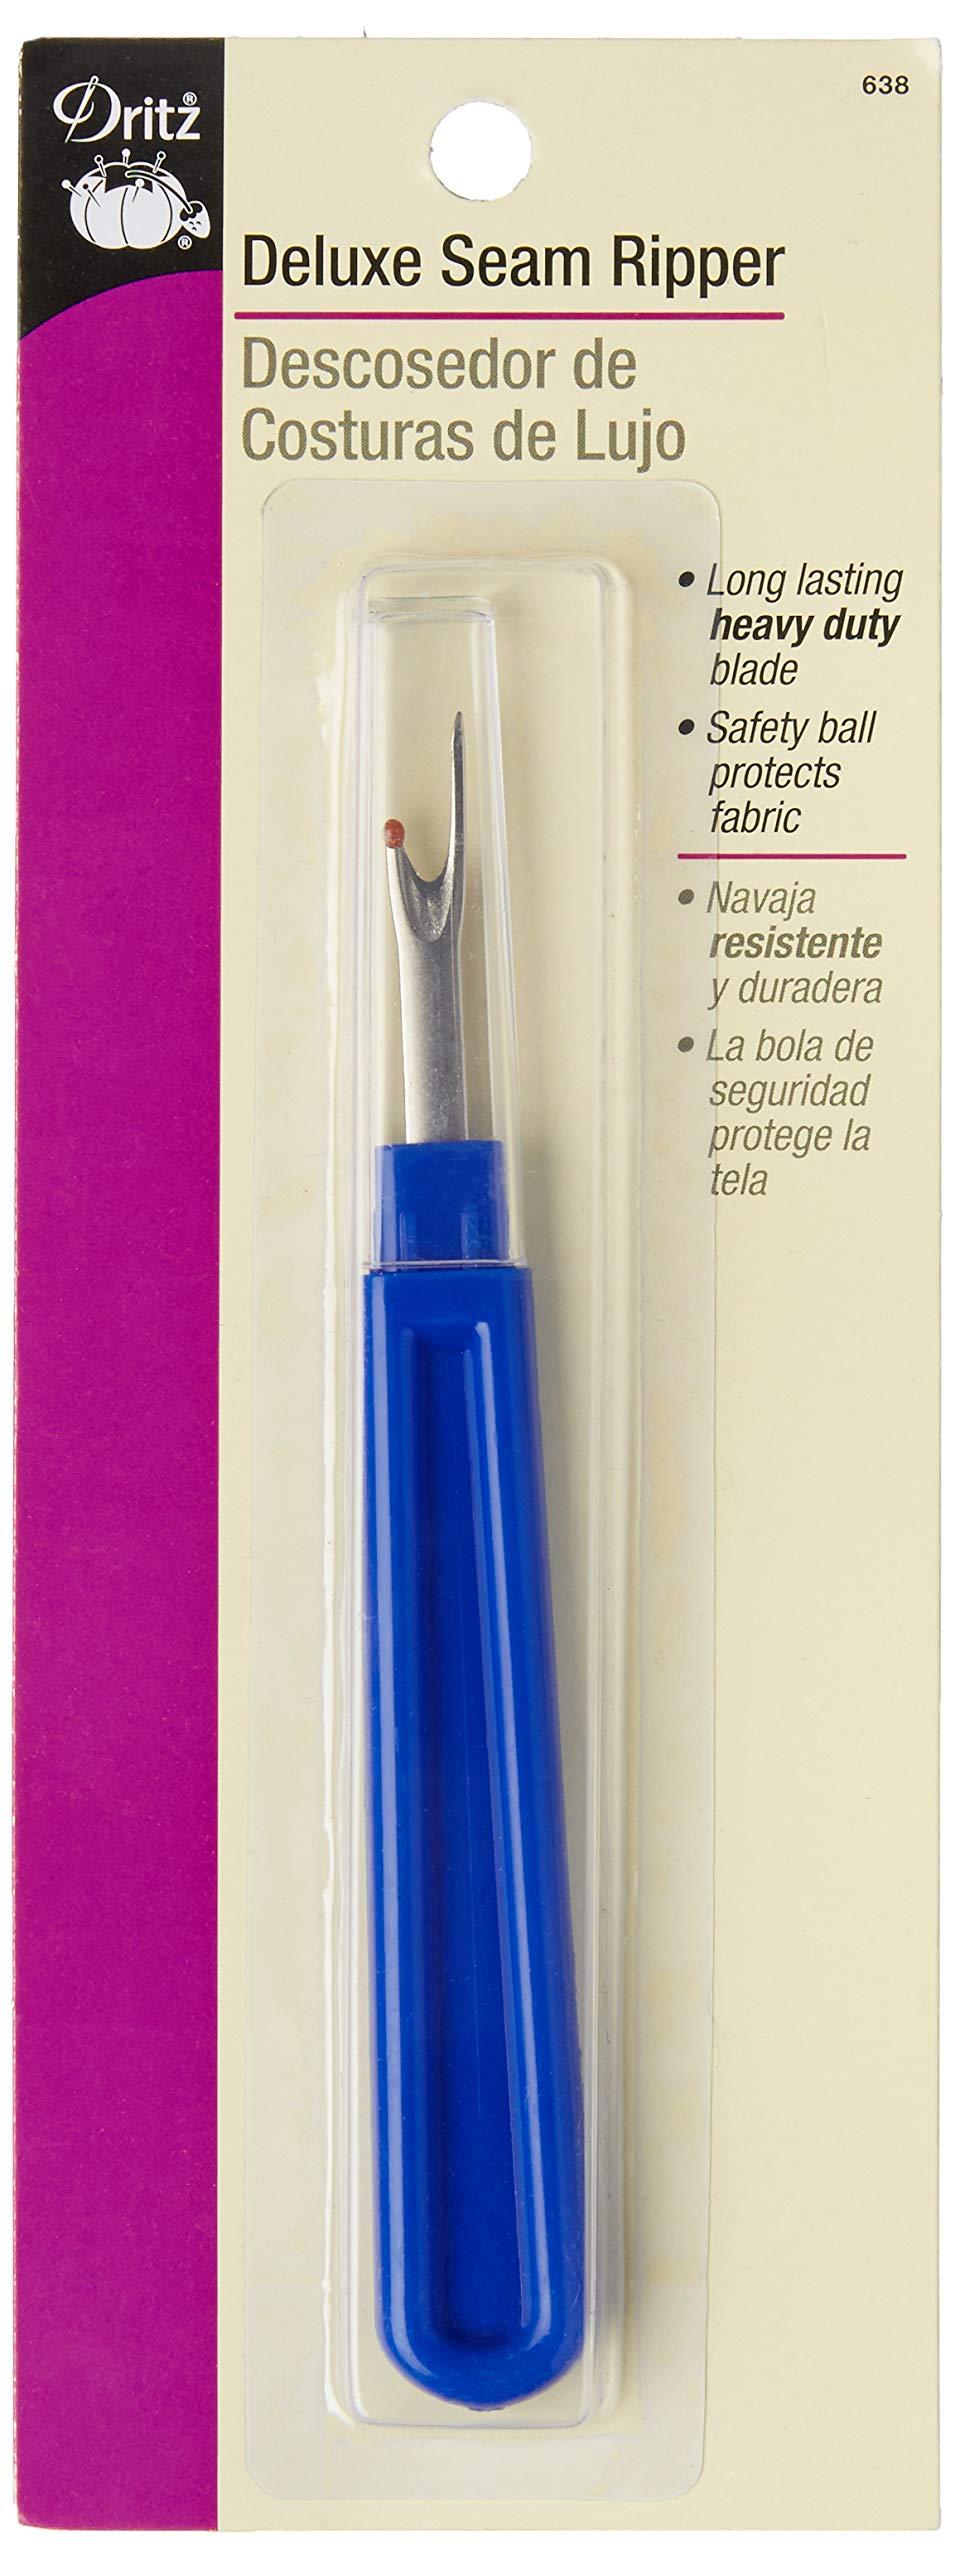 Dritz Bulk Package Deluxe Seam Ripper, 100-Pack, Blue by Dritz